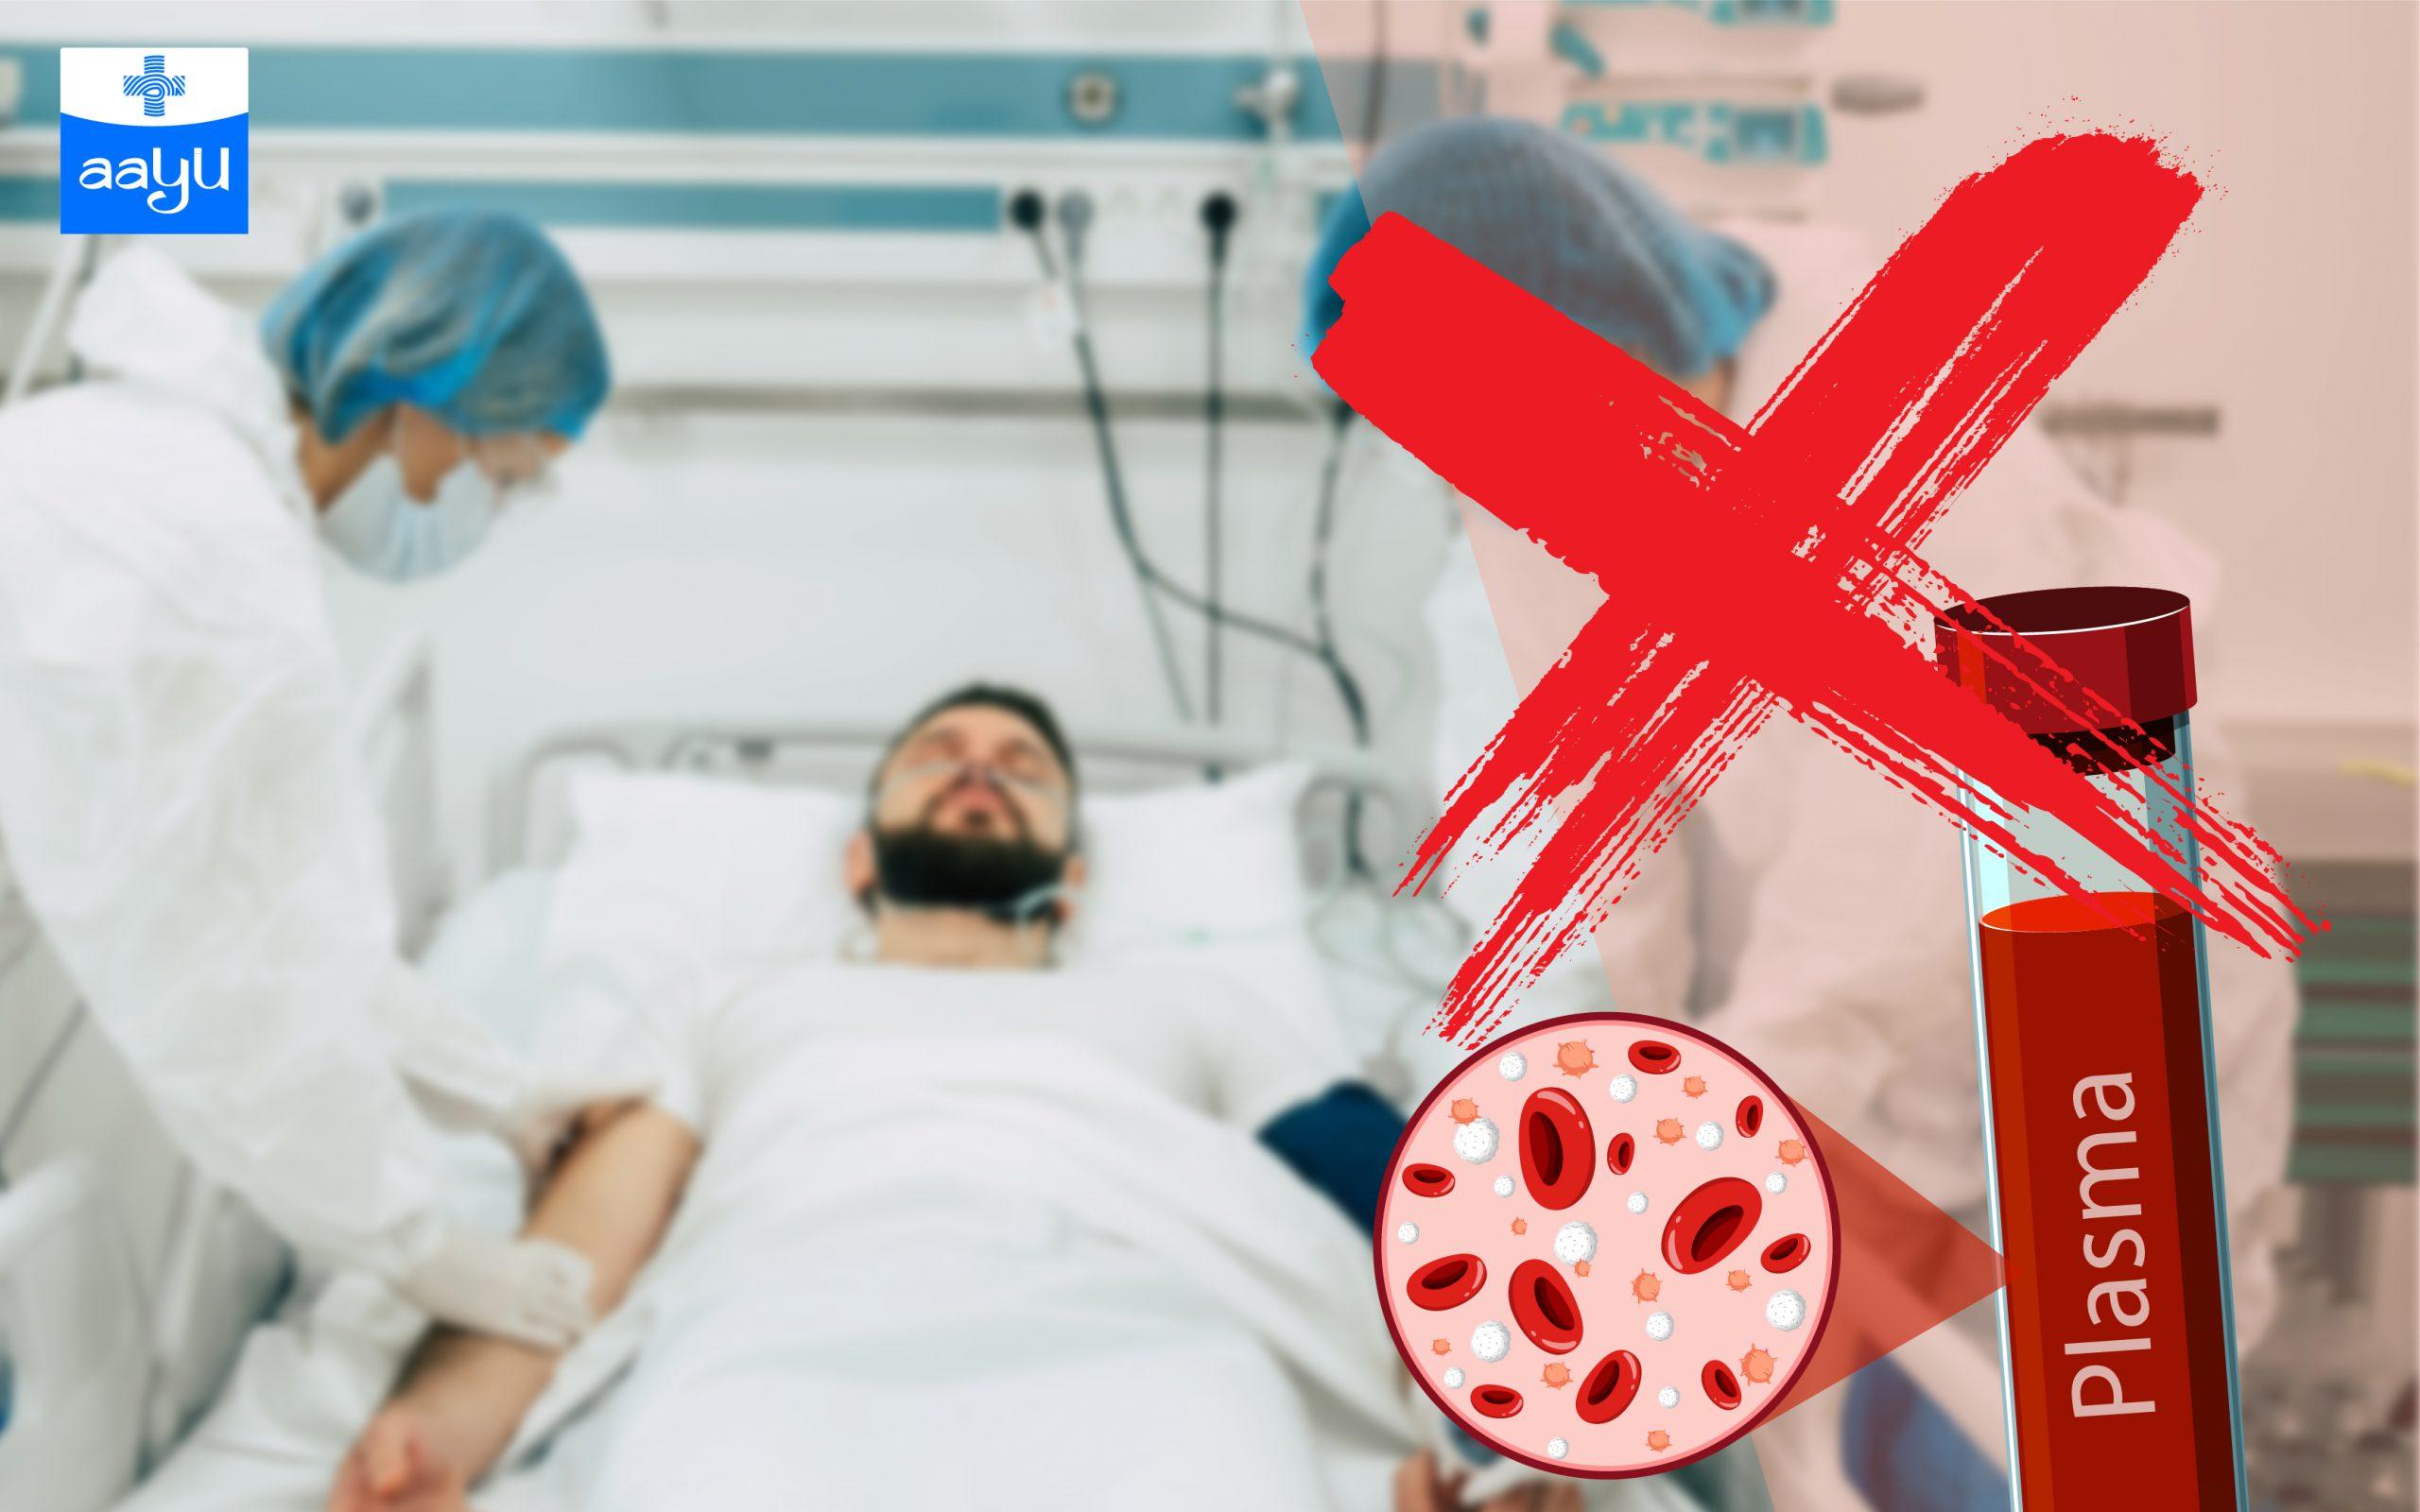 Plasma Therapy: अब नहीं होगा प्लाज्मा थेरेपी से कोरोना का इलाज-ICMR